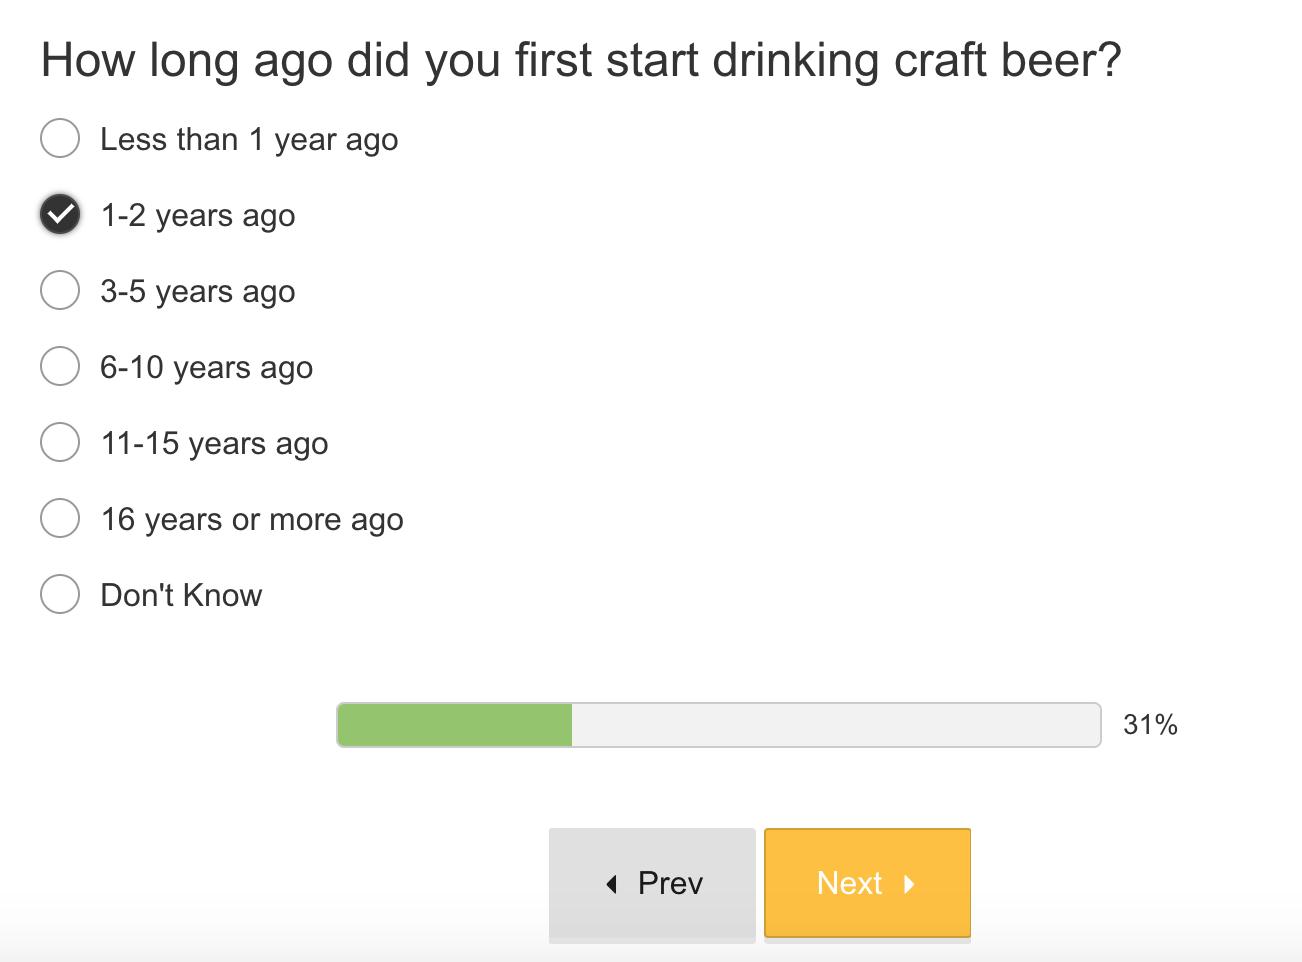 Screenshot showing a survey question